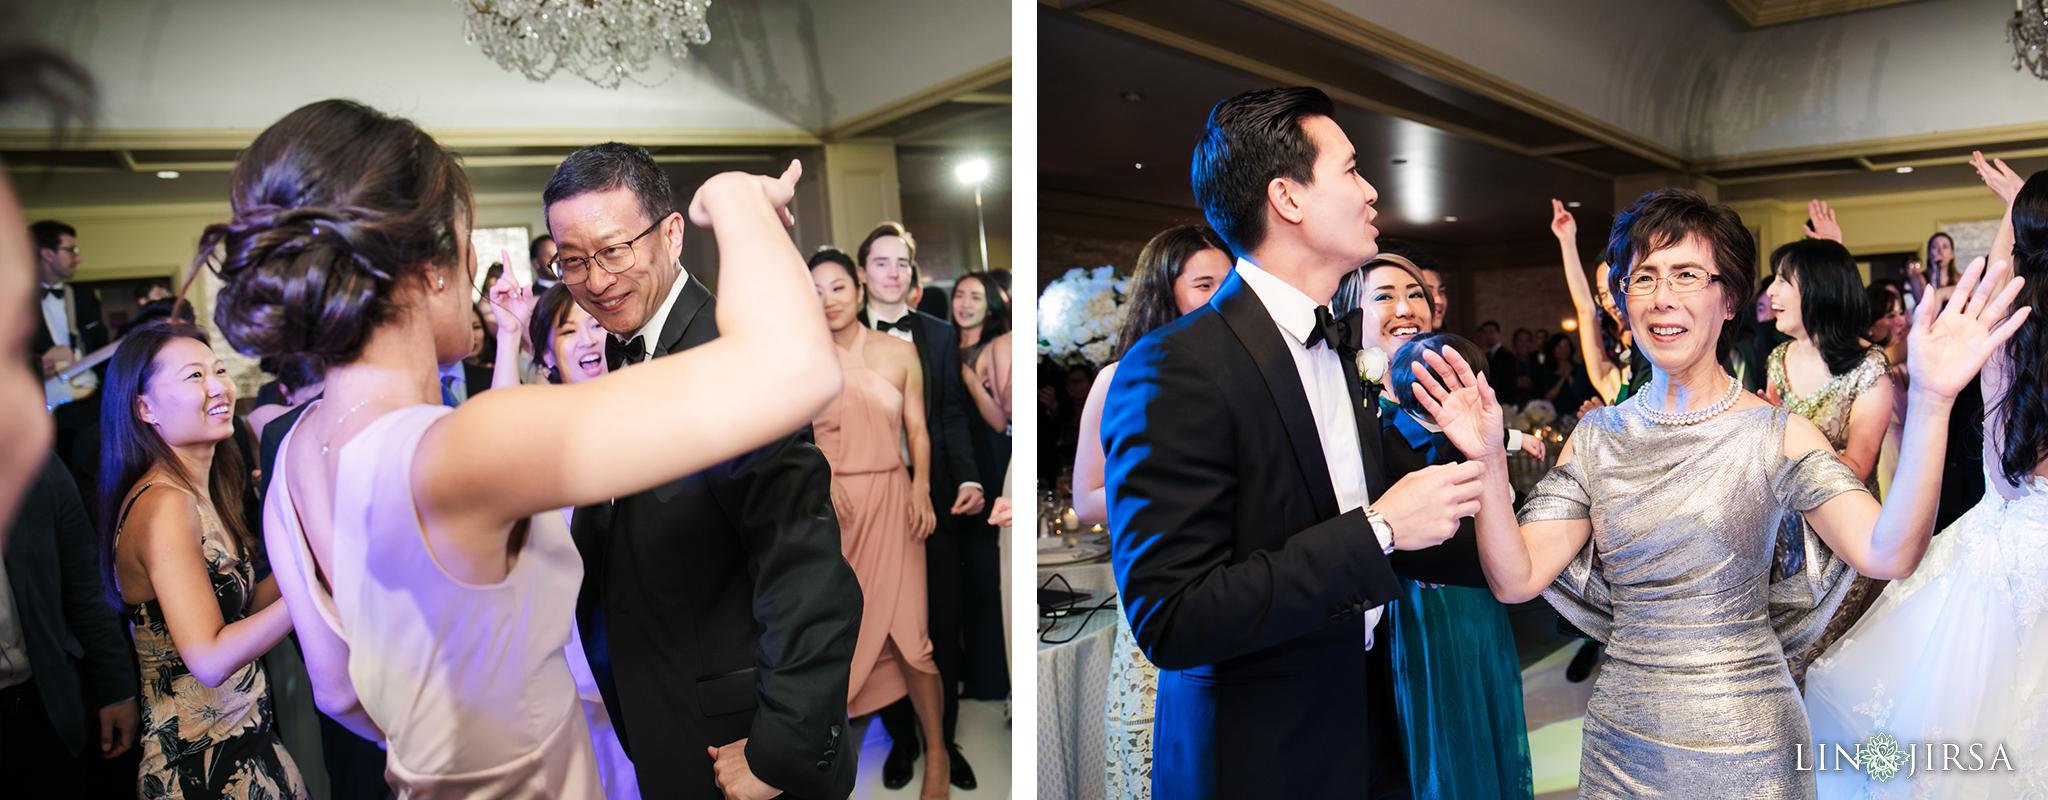 44 Ritz Carlton Laguna Niguel Wedding Photography